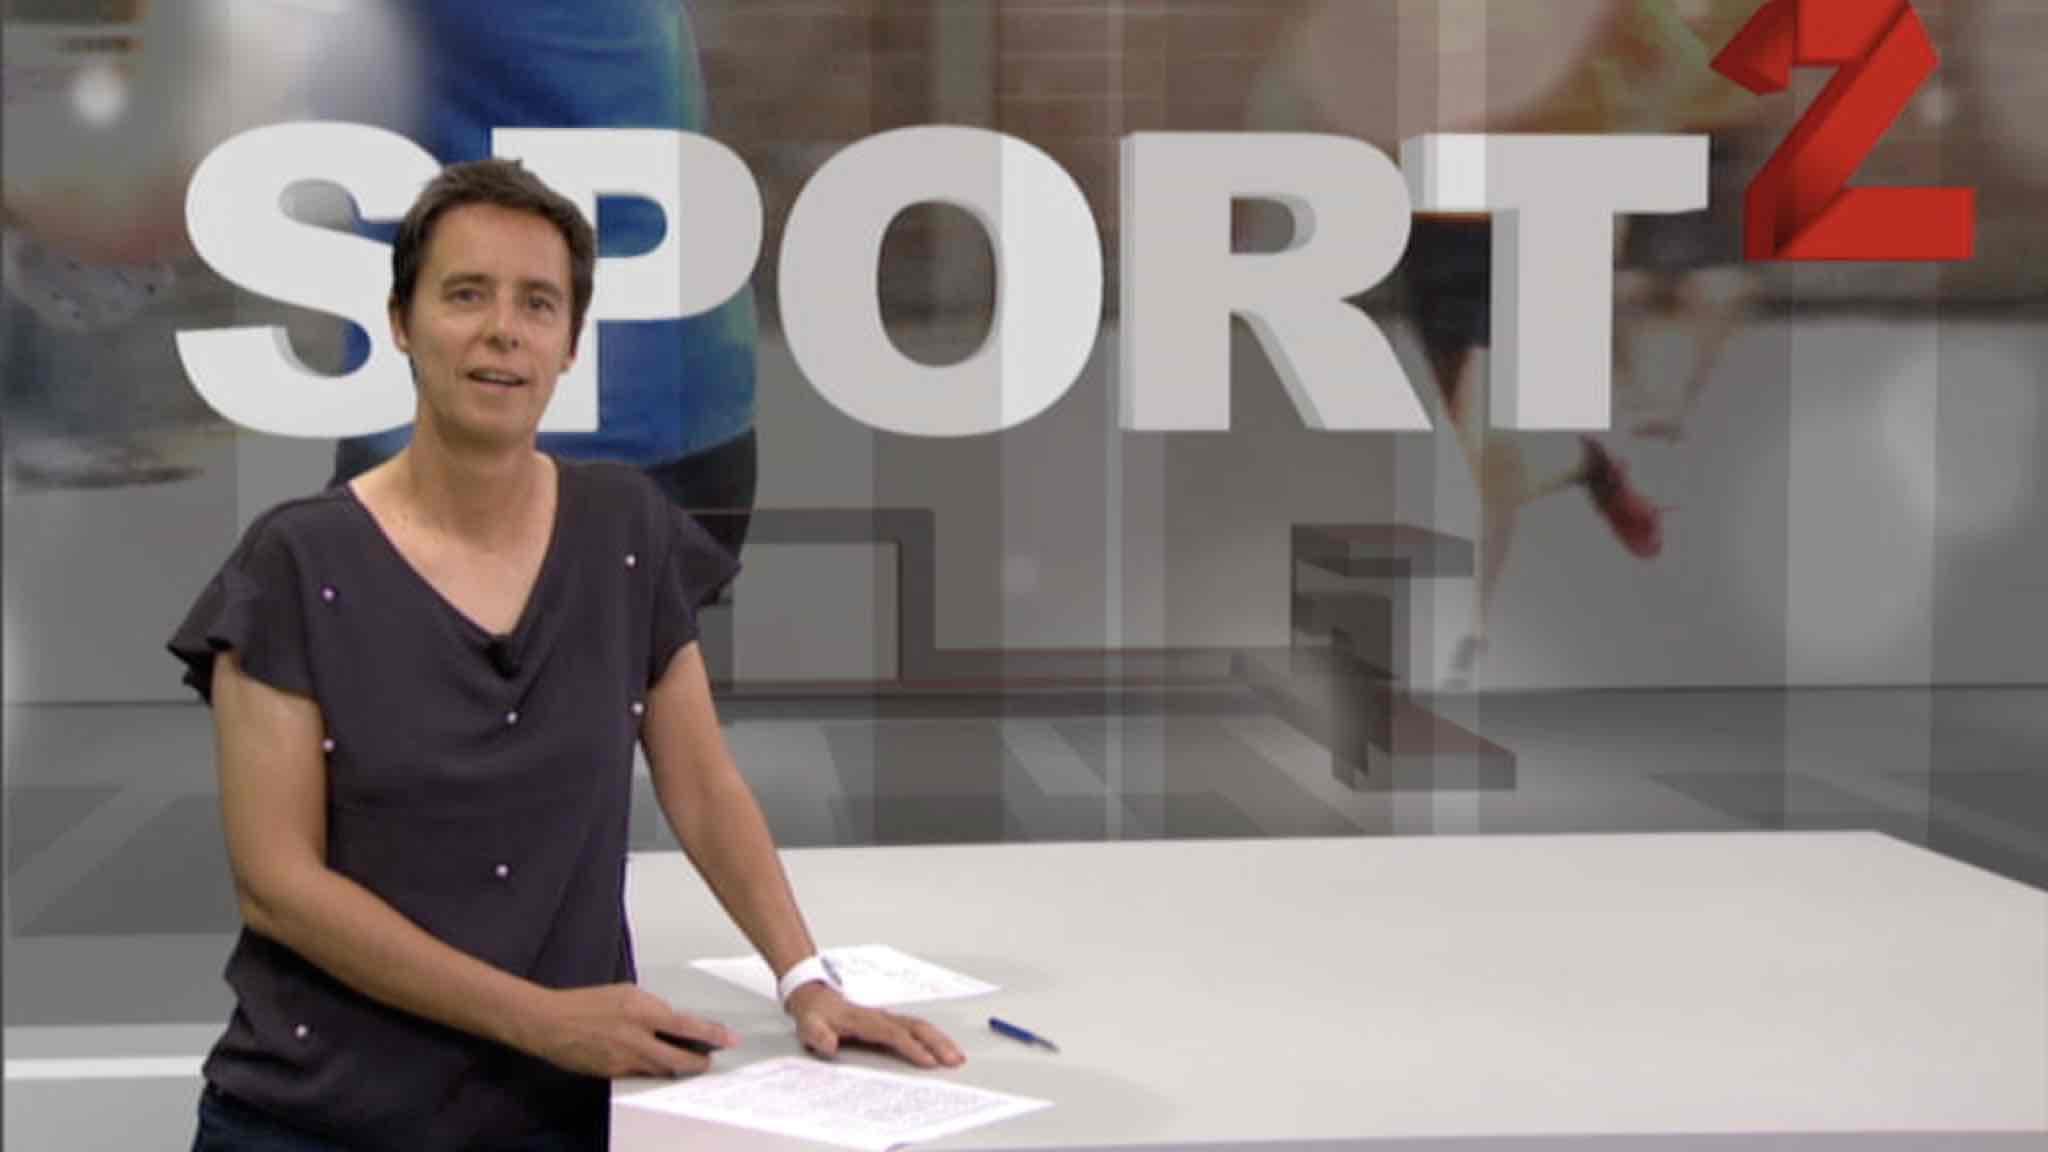 Sport2 - 18/06/18